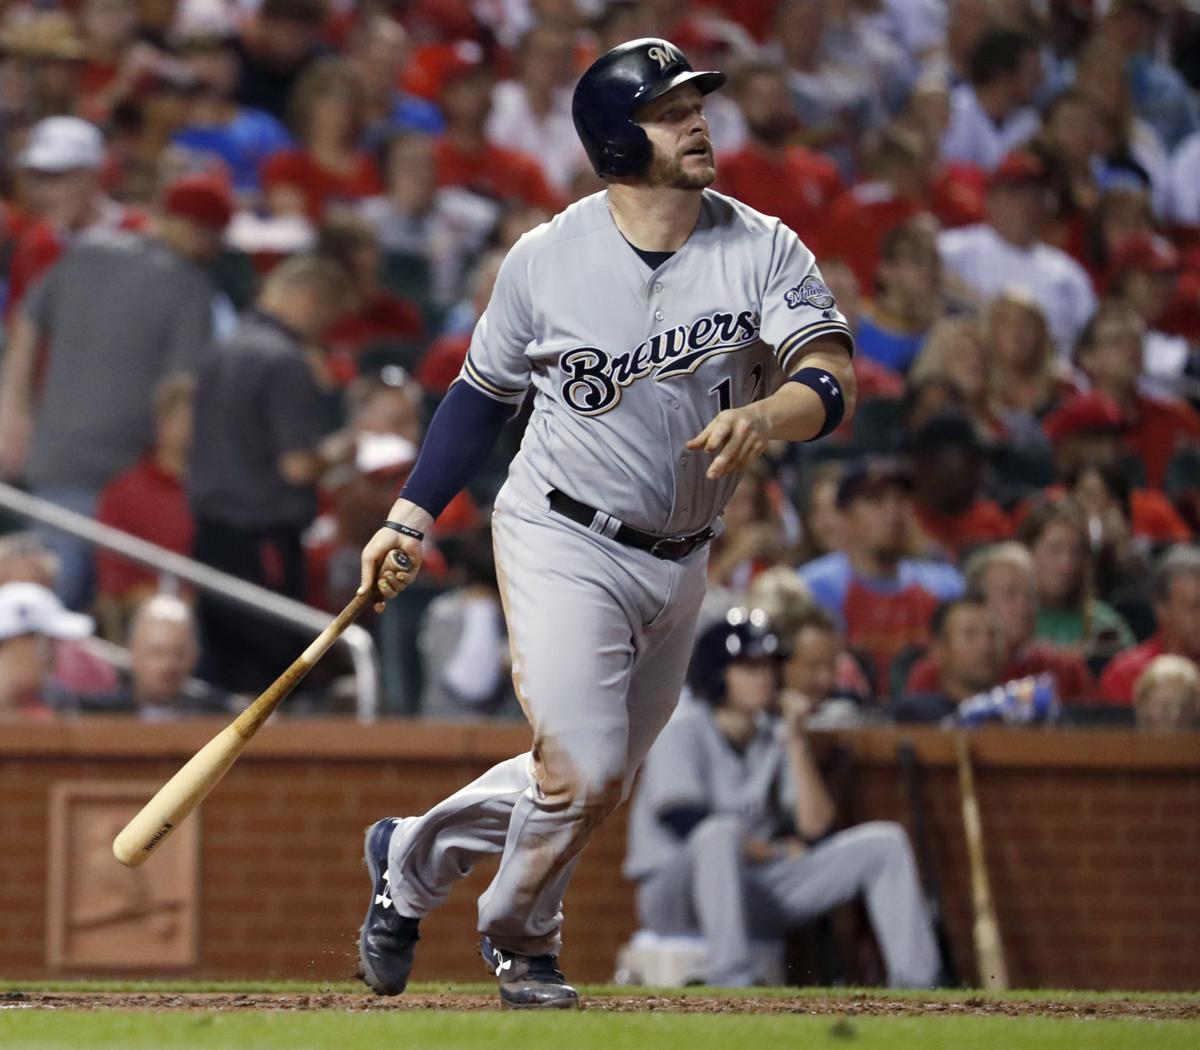 Stephen Vogt hitting, too vertical, AP photo